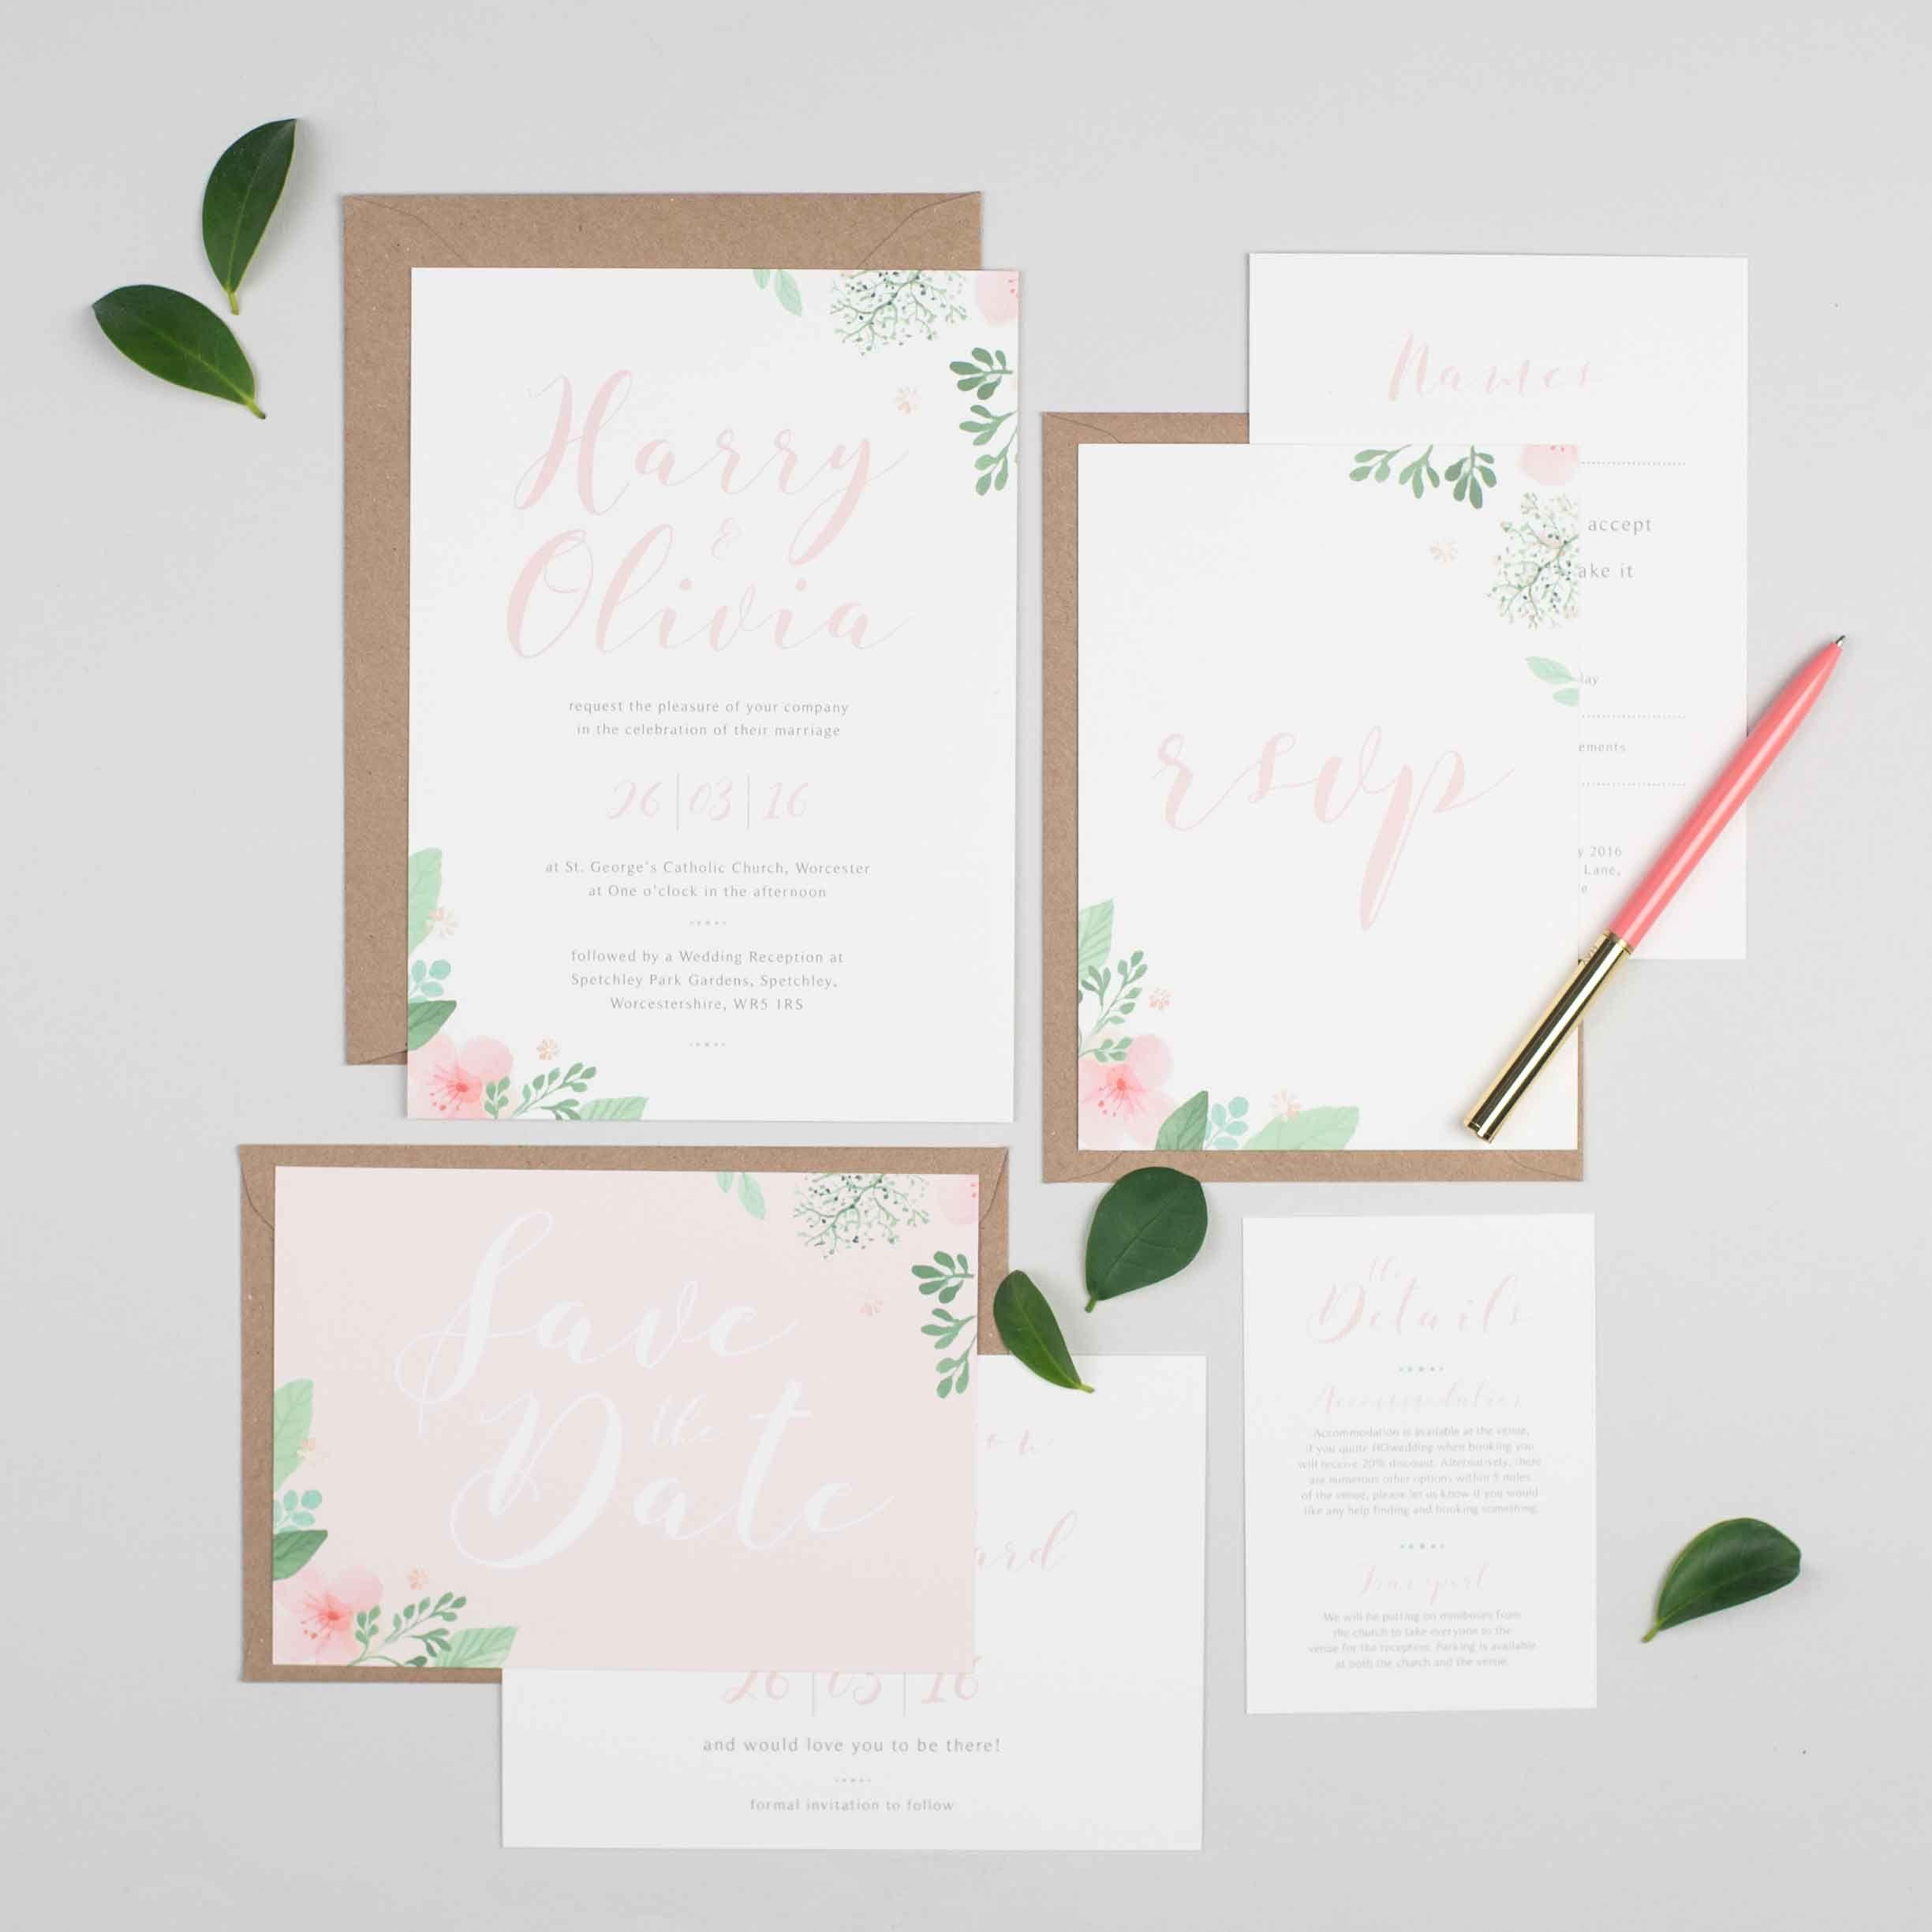 Floral Wedding Invitation Suite | Wedding Invite | Floral Wedding ...